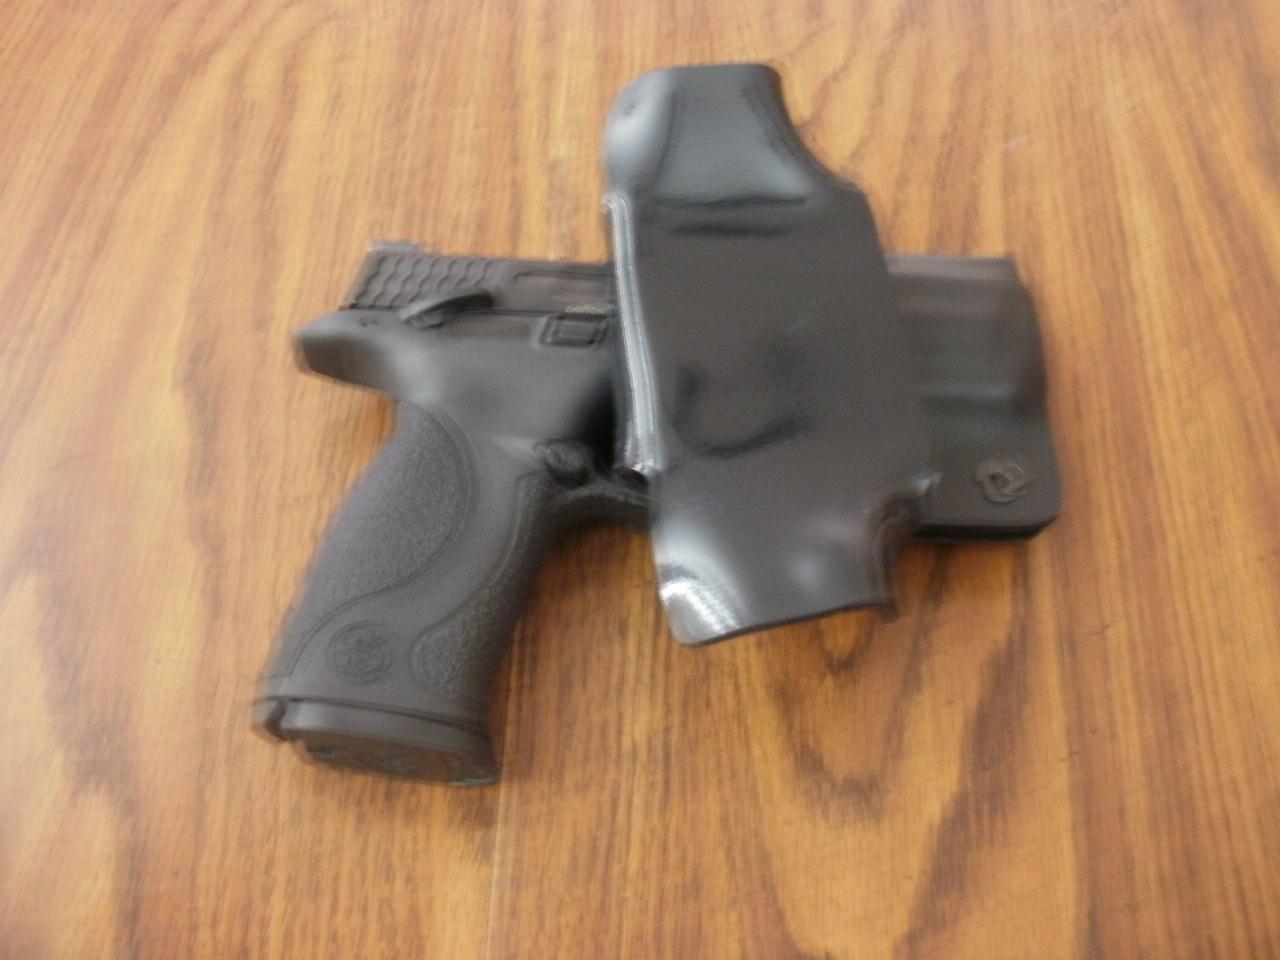 Comfortable OWB SR9c holster - cheap-p3030367.jpg